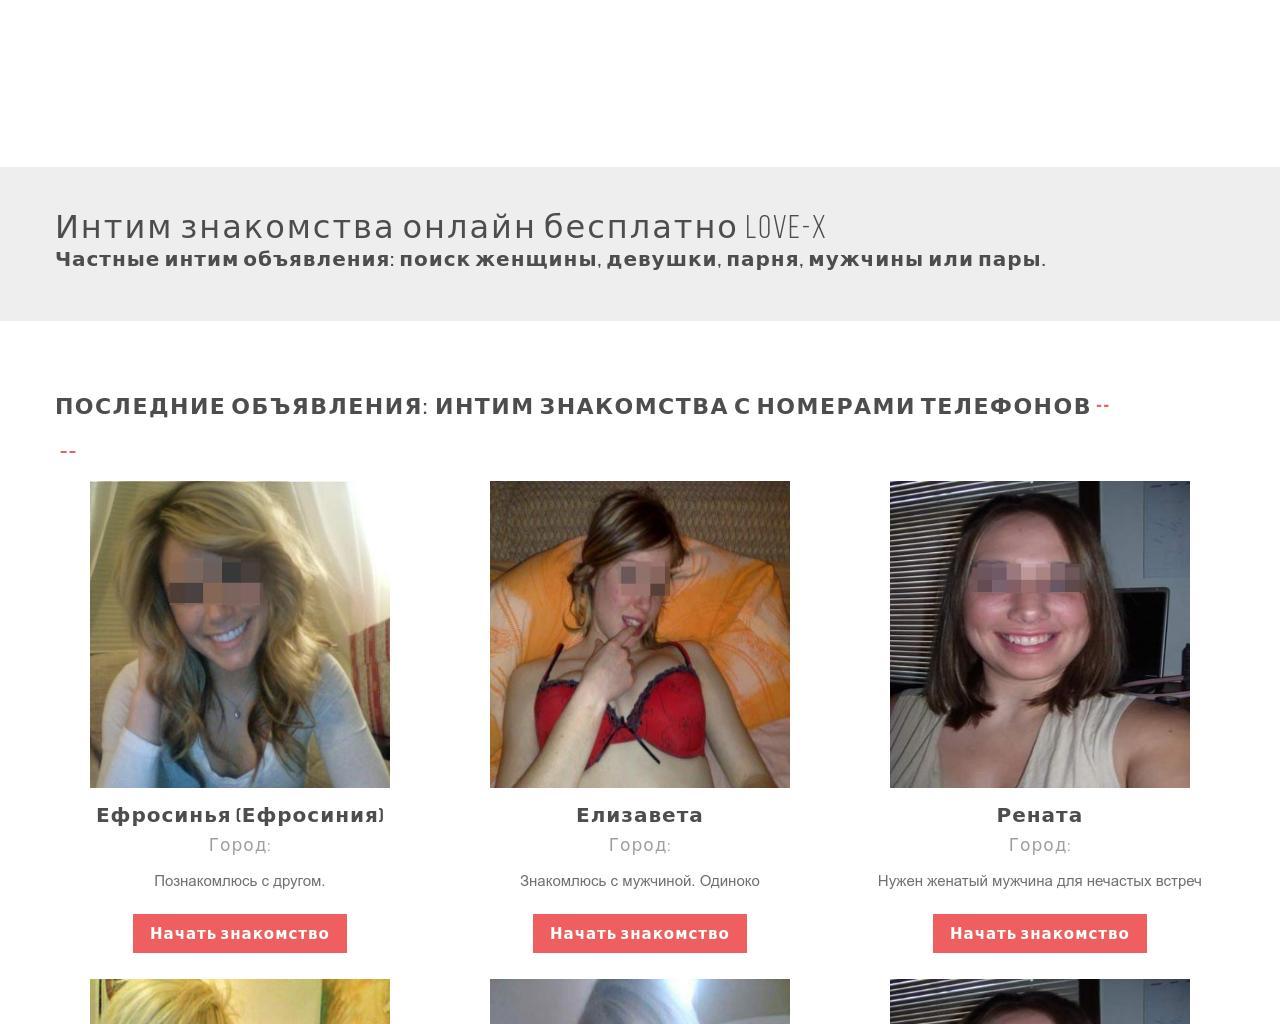 Объявление Знакомства Онлайн